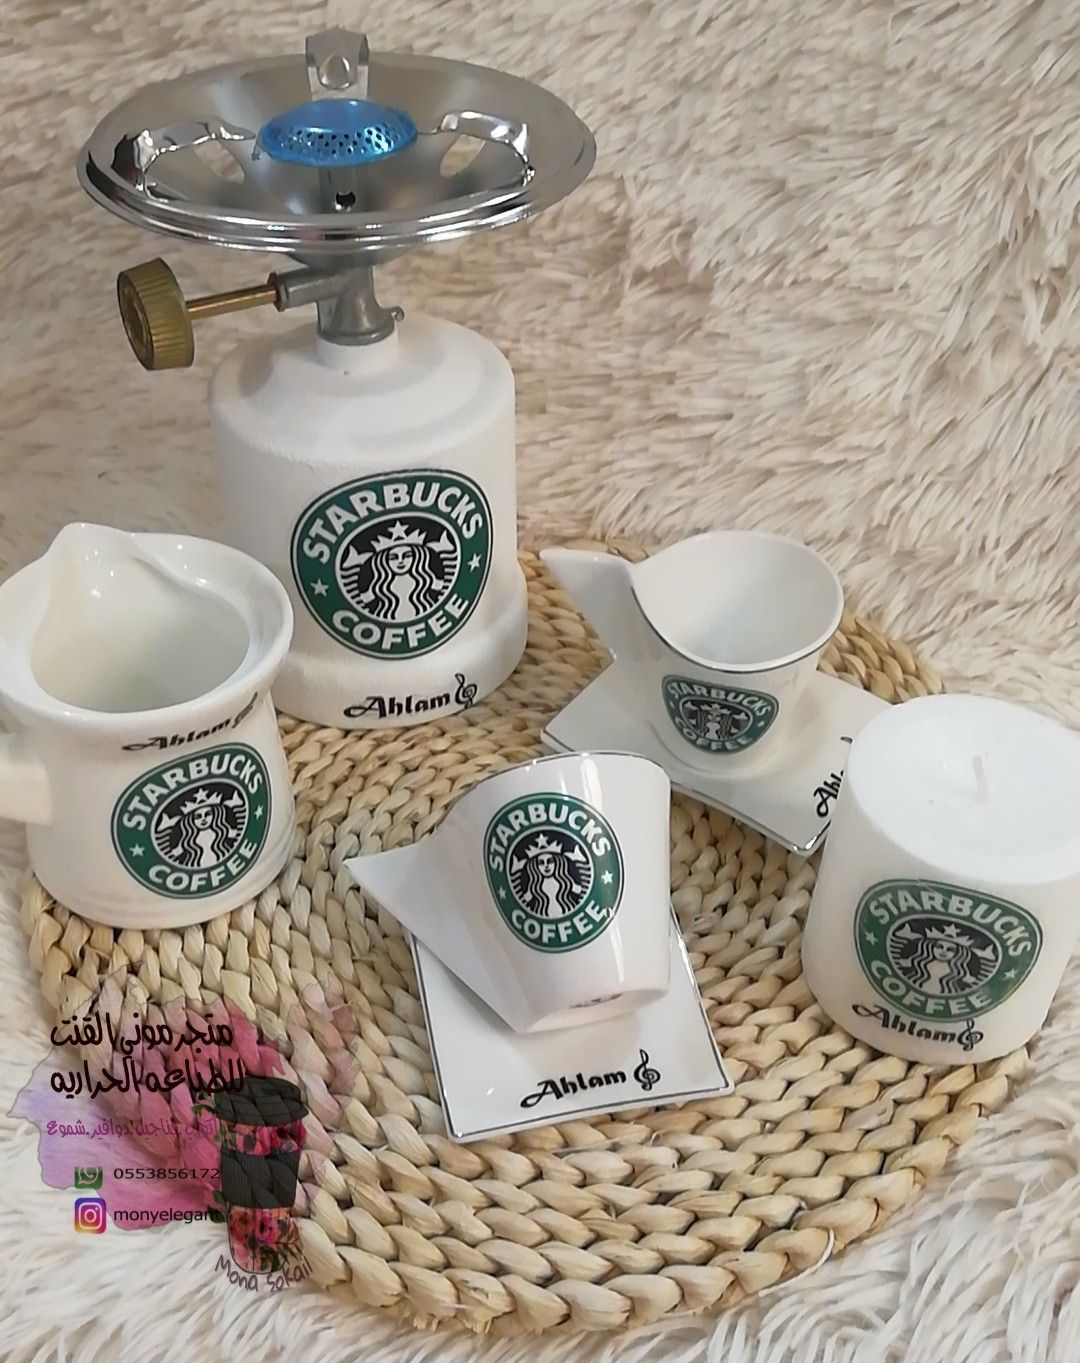 طقم دافور مكون من دافور كنكه كوبين قهوه تركي Monyelegnt انستا Sugar Bowl Set Cricut Creations Bowl Set